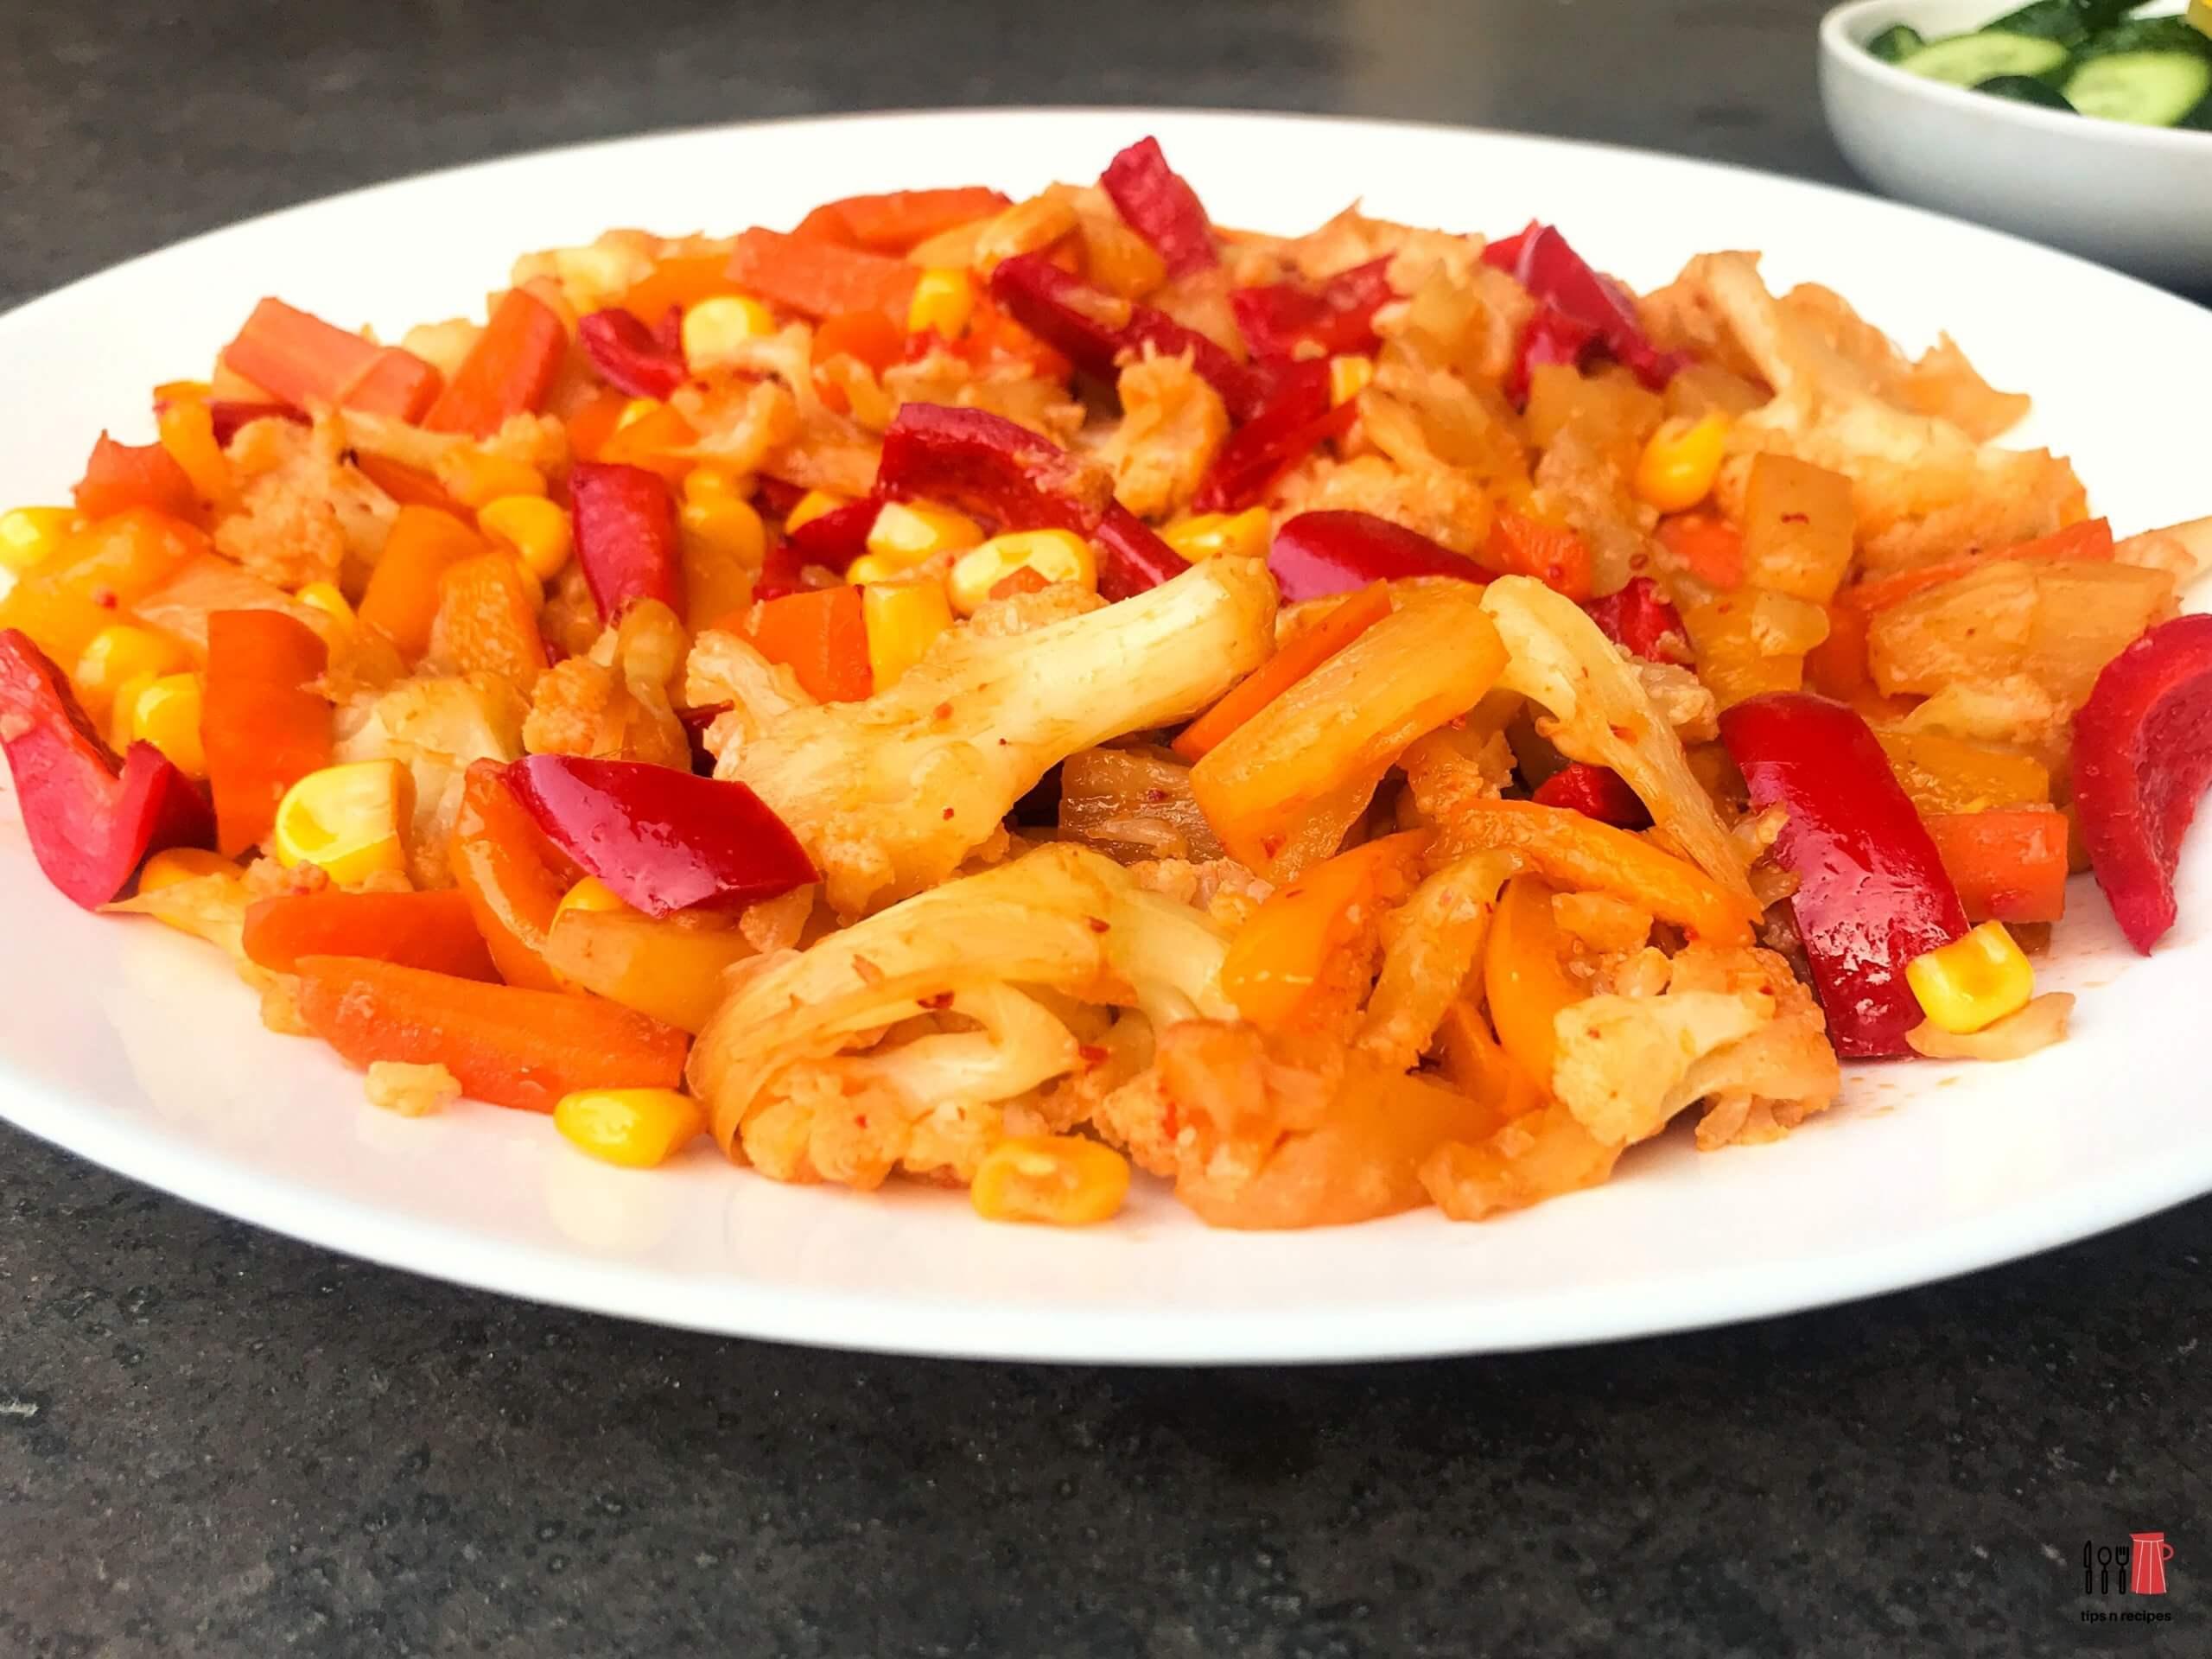 Healthy Stir Fry Veggies Recipe